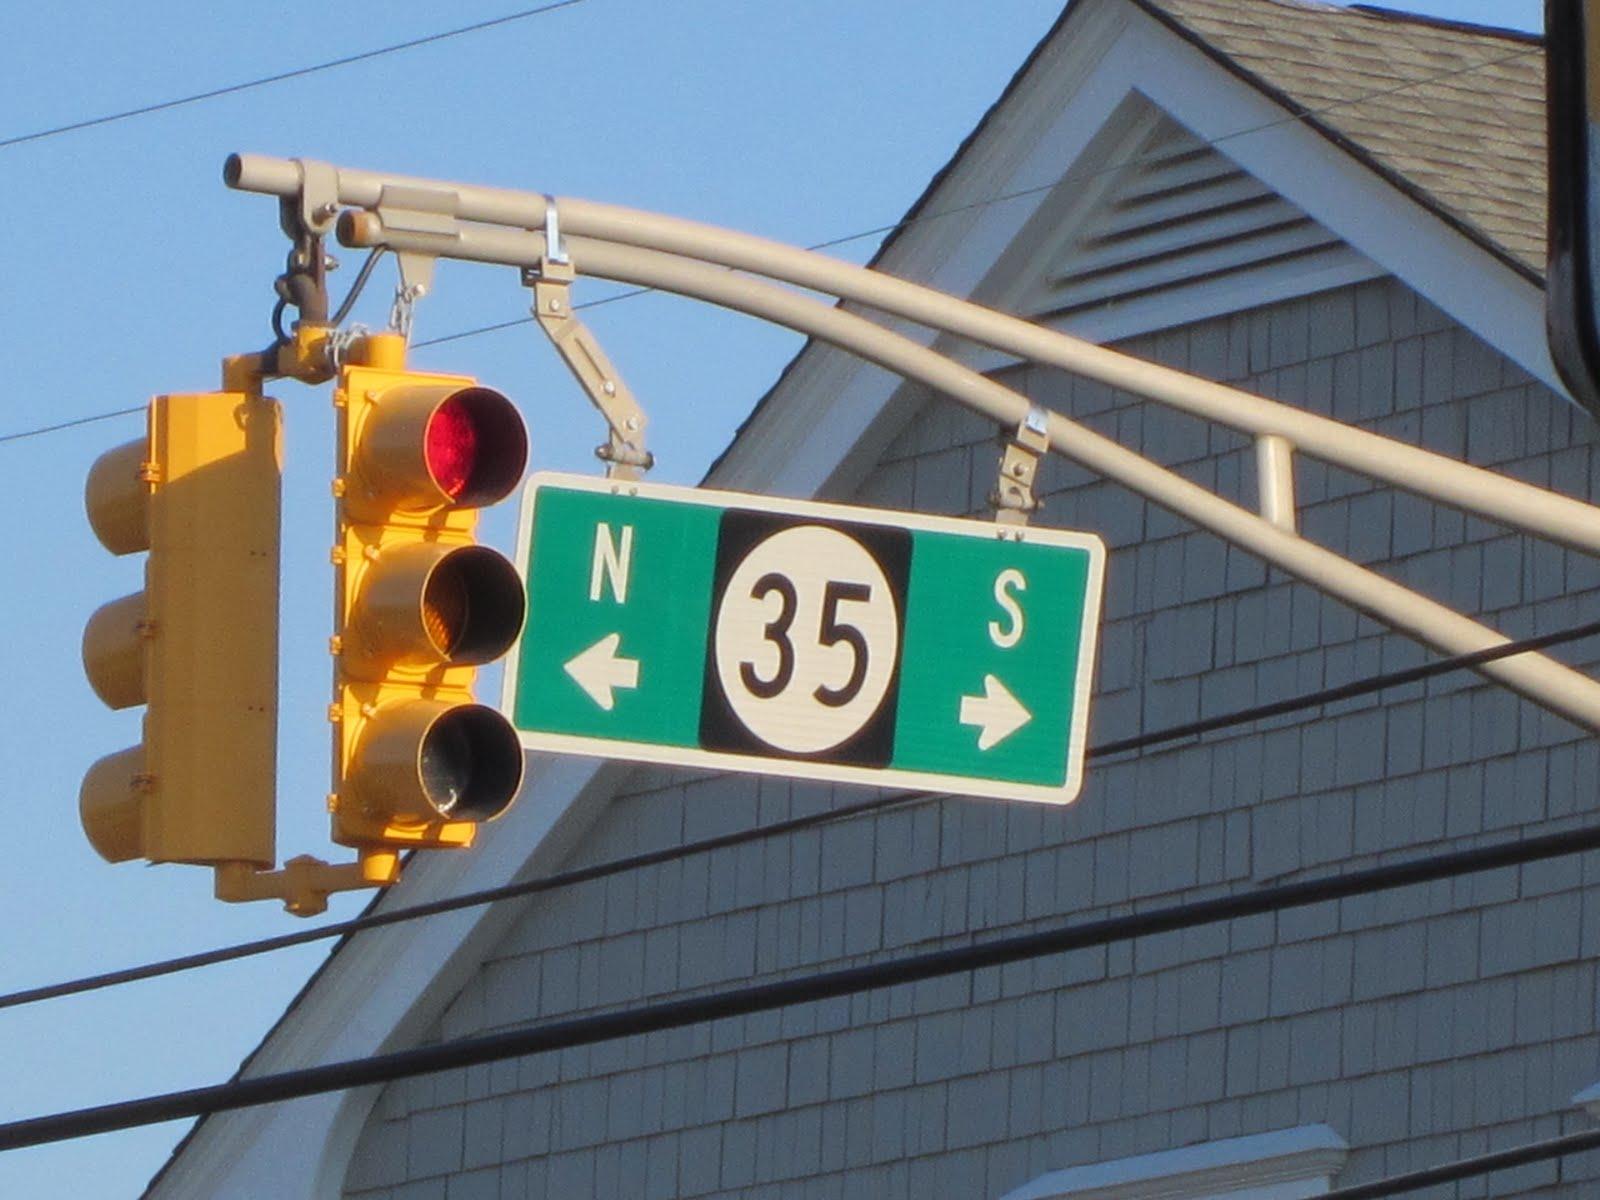 Rt. 35 Jersey Shore